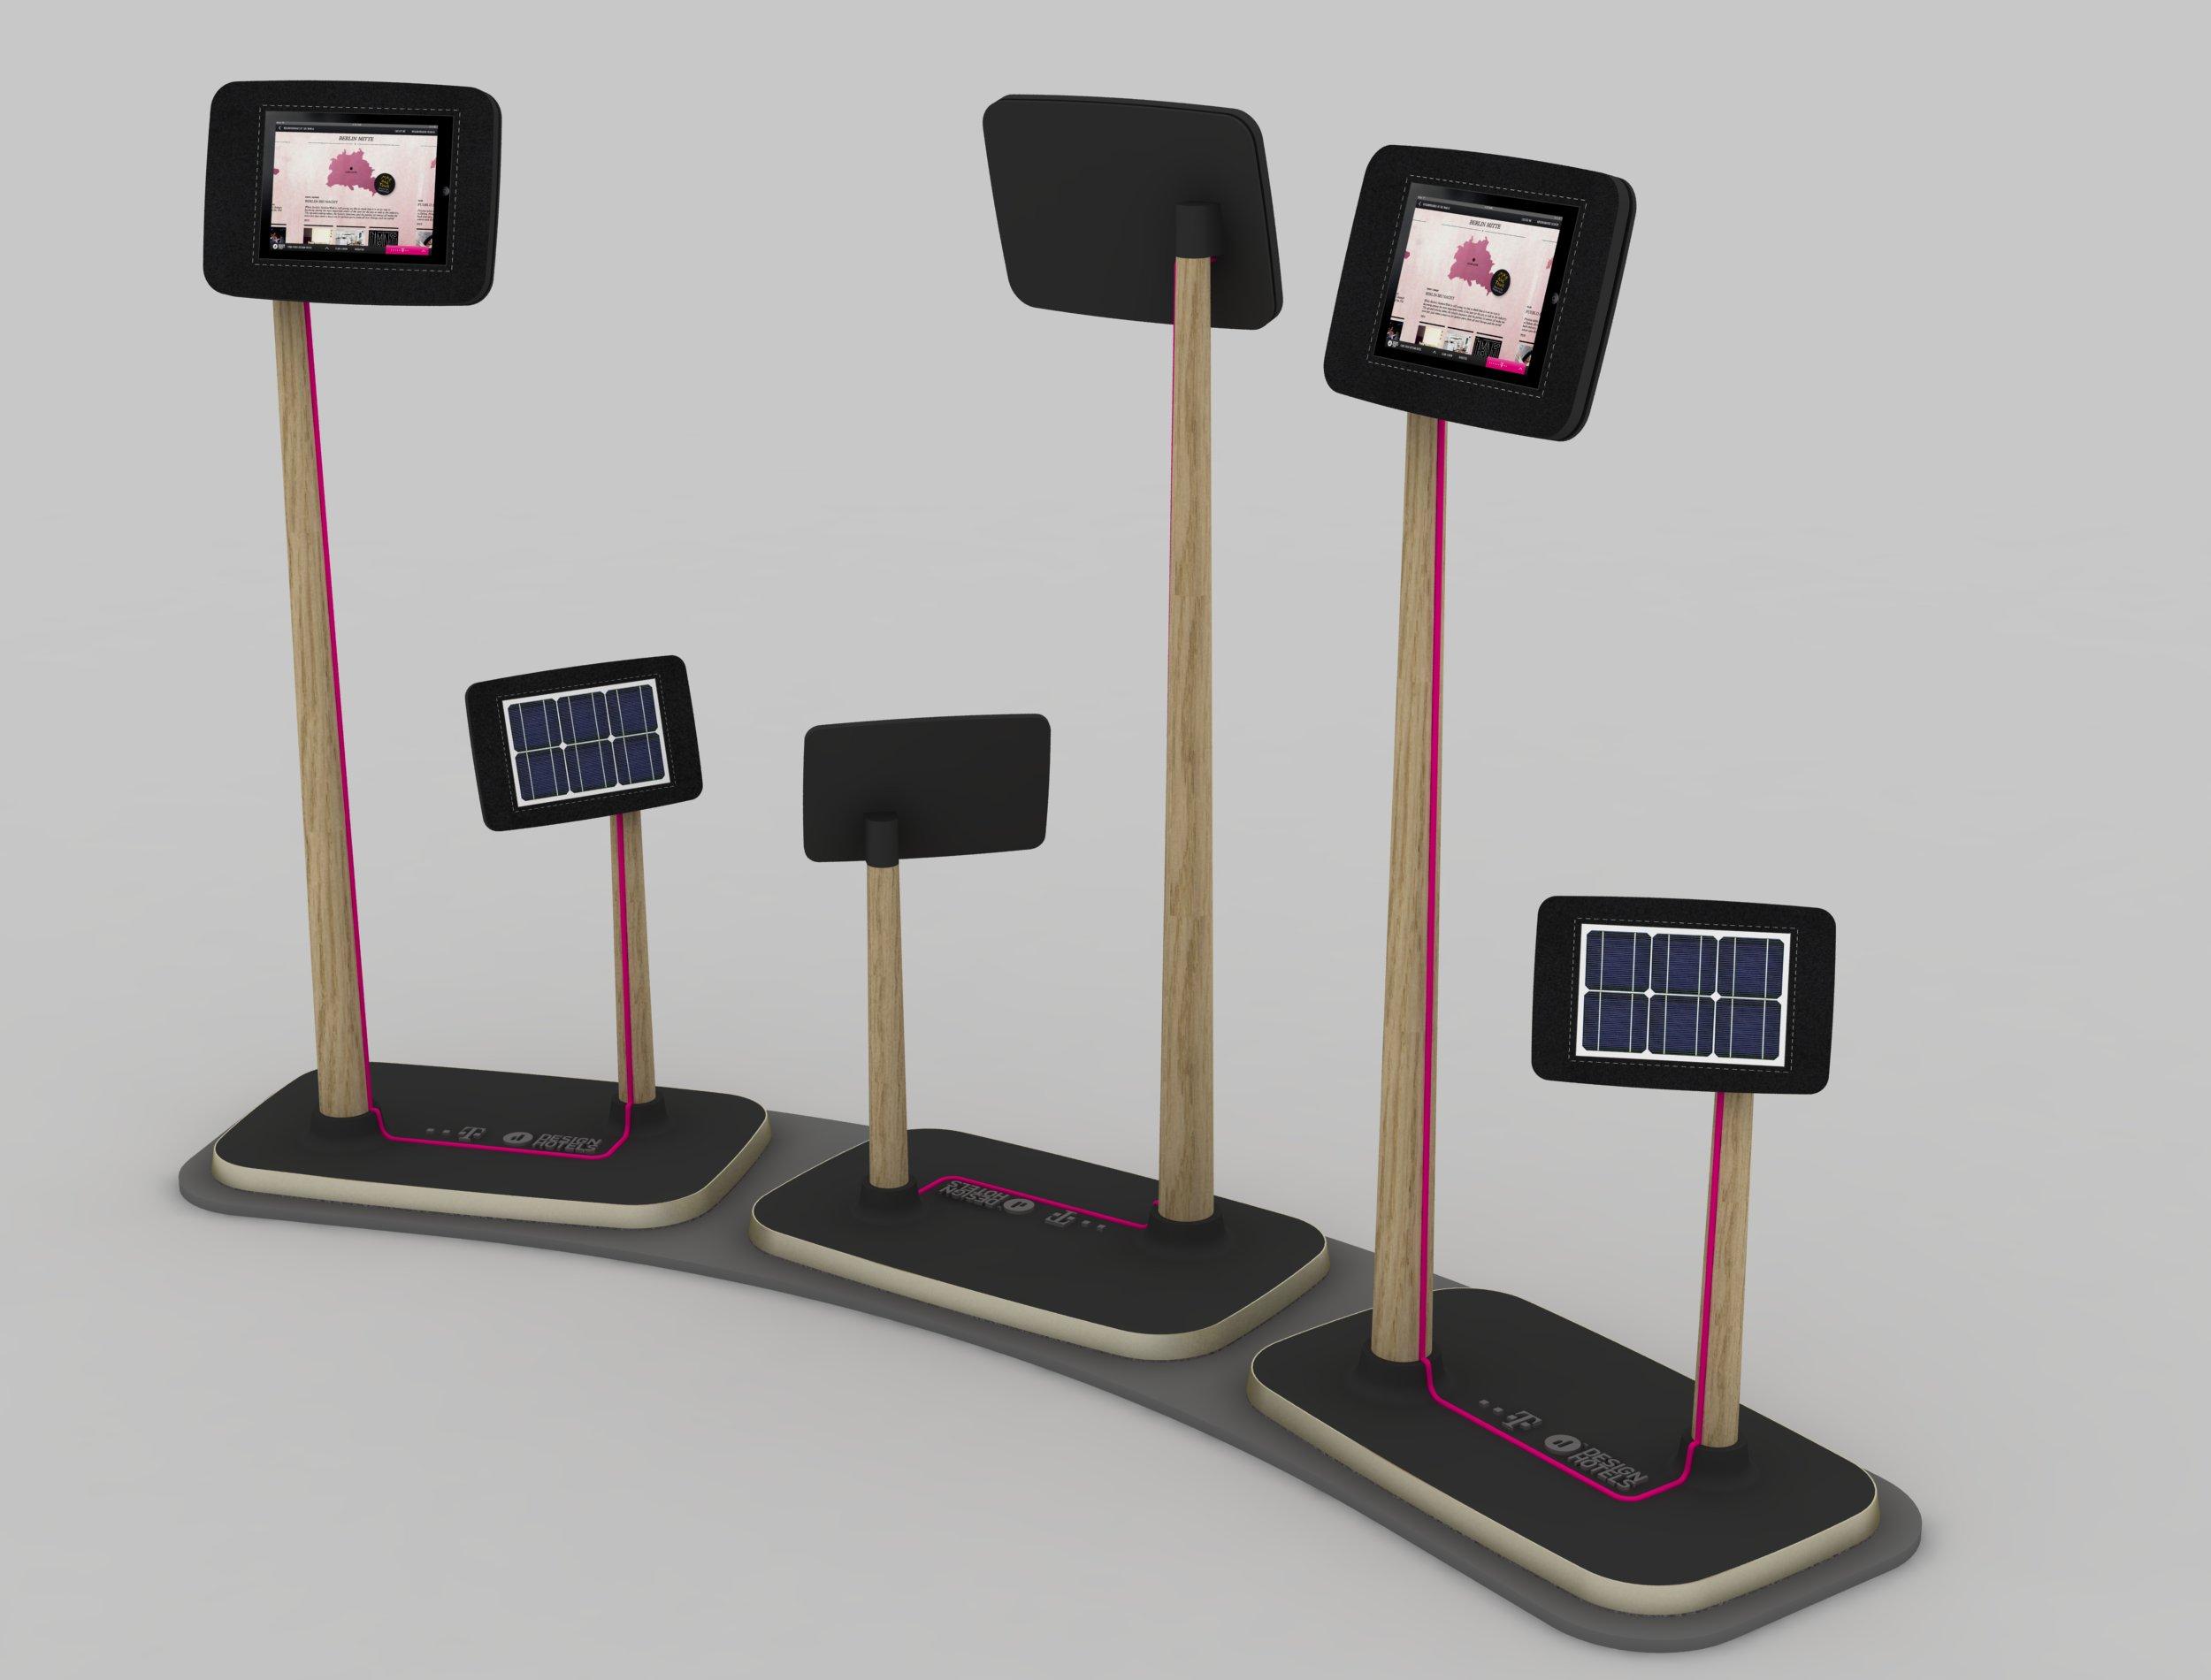 thieswulf product ipad case holder deutsche telekom. Black Bedroom Furniture Sets. Home Design Ideas